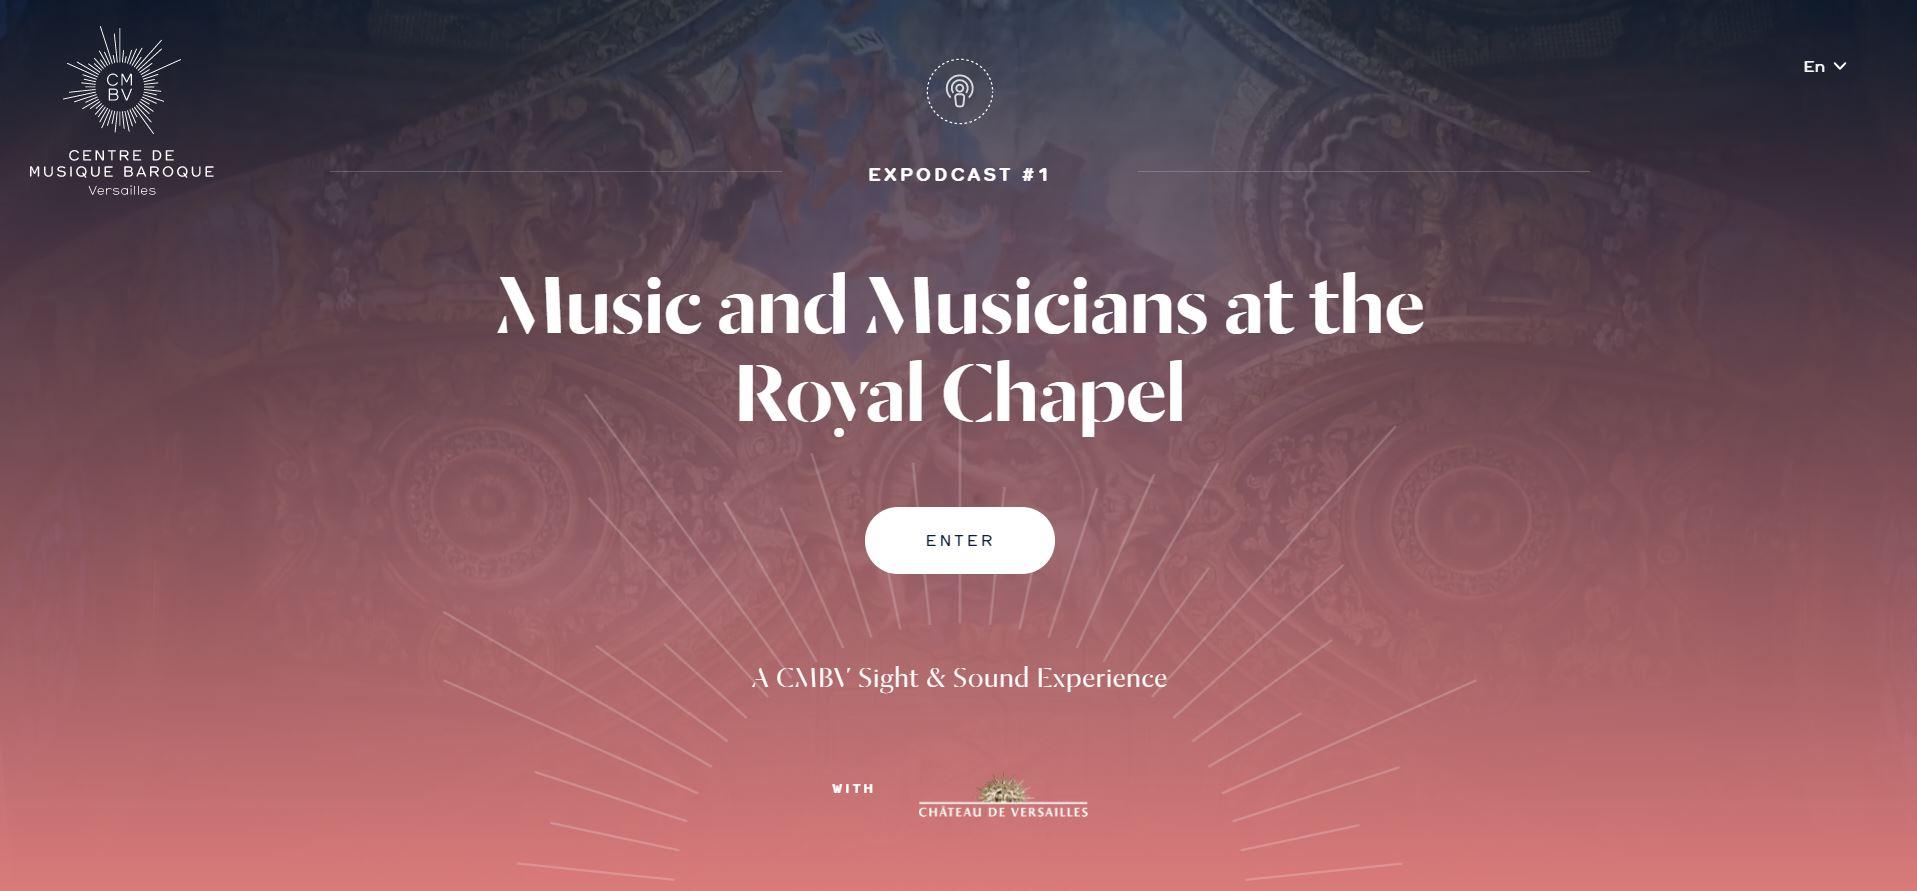 Music and musicians at the royal chapel